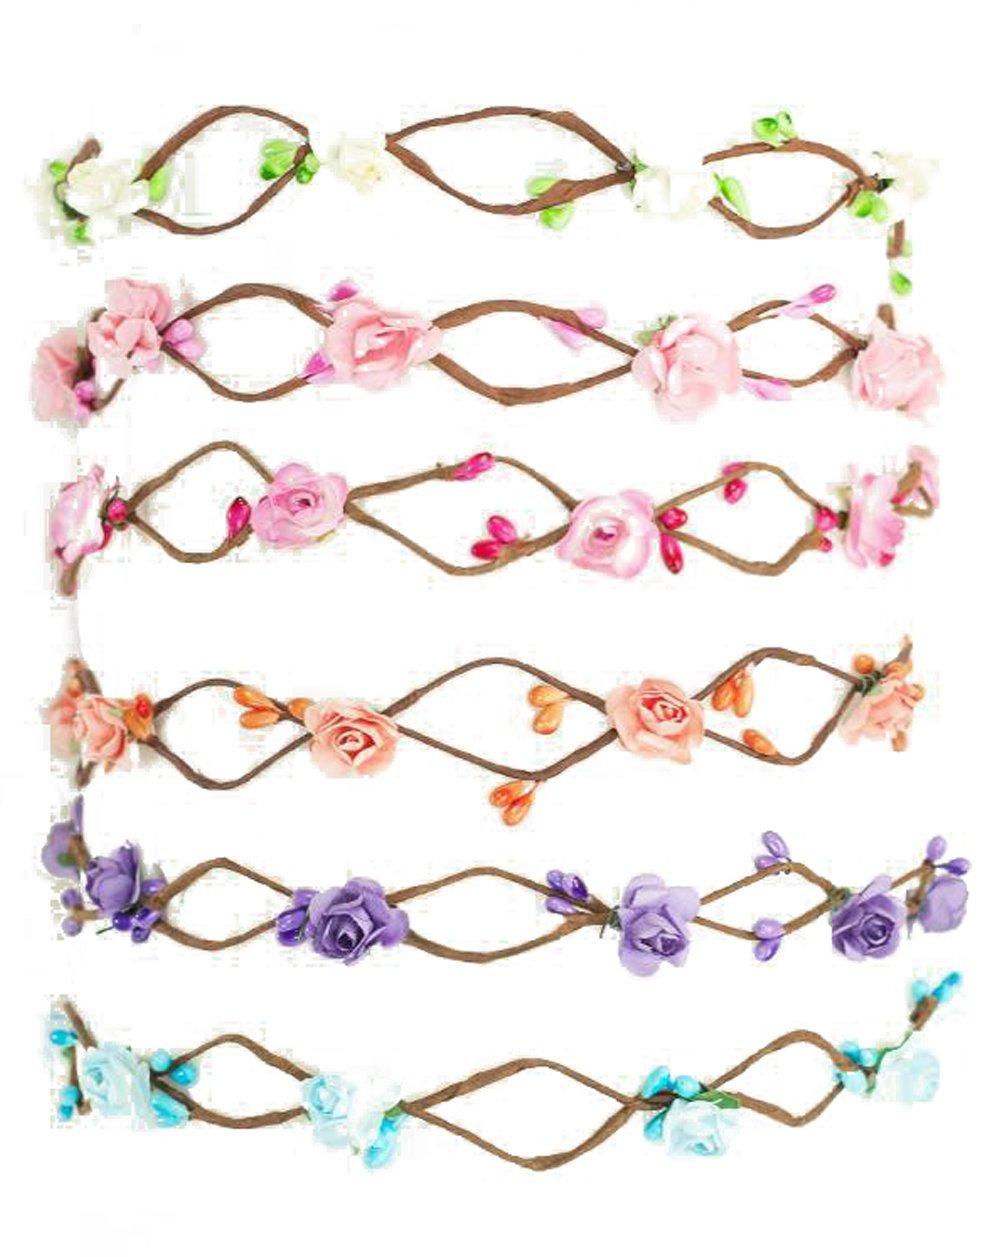 Boho Flower Crown for Bride and Bridesmaid Bachelorette Floral Headband Flower Wreath (6 Pack Bundle: 1 of Each Color (White, Light Pink, Dark Pink, Purple, Blue, Peach), 6)